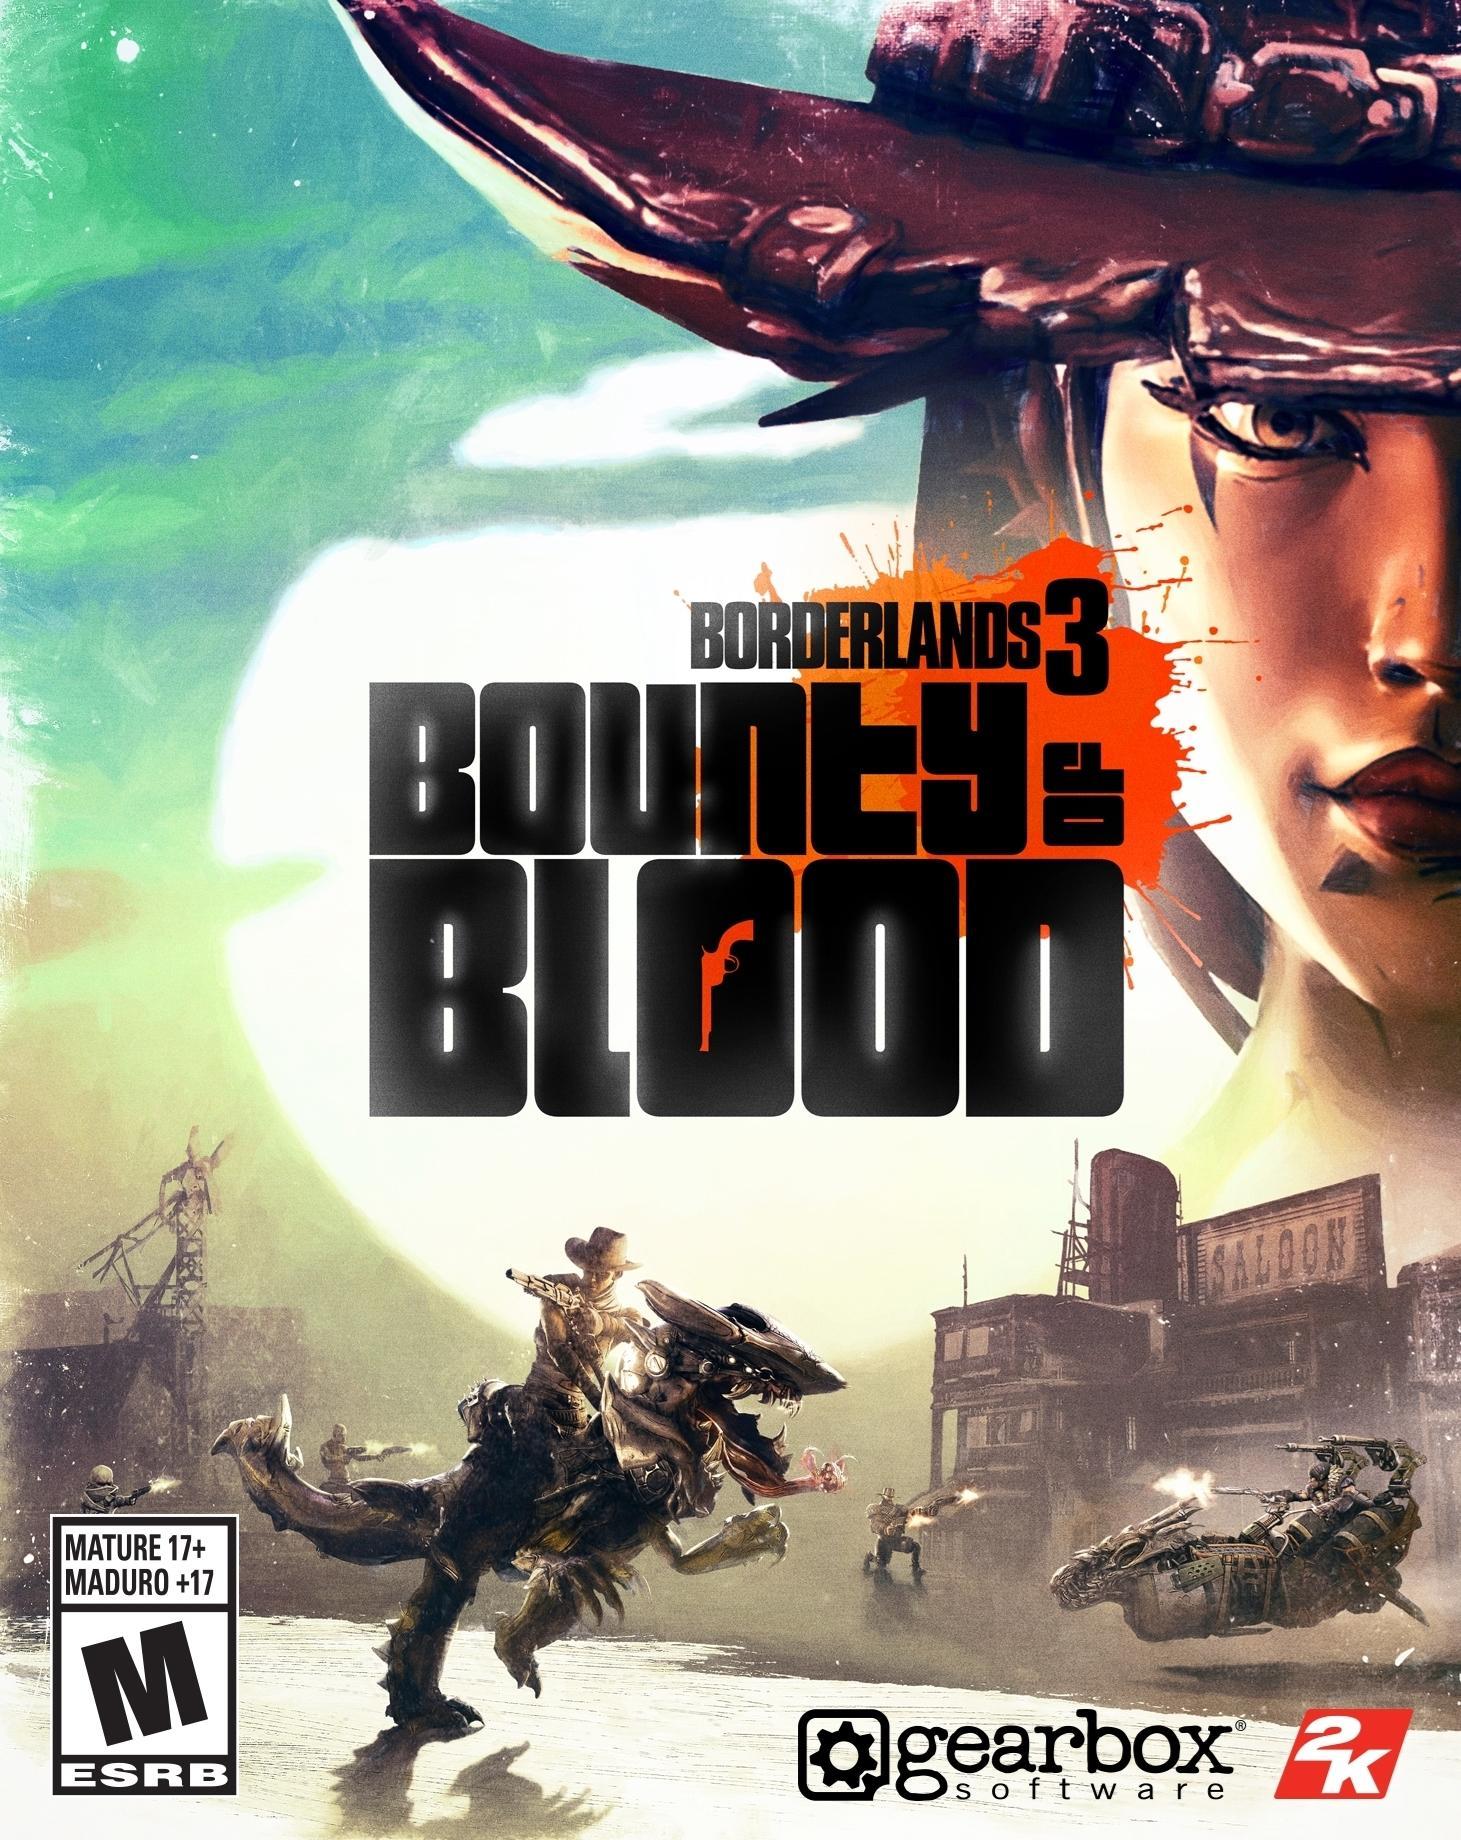 Borderlands 3: Bounty of Blood (Steam) | ROW (b3d96cf5-5ac9-47ee-a871-3fe95d487e49)